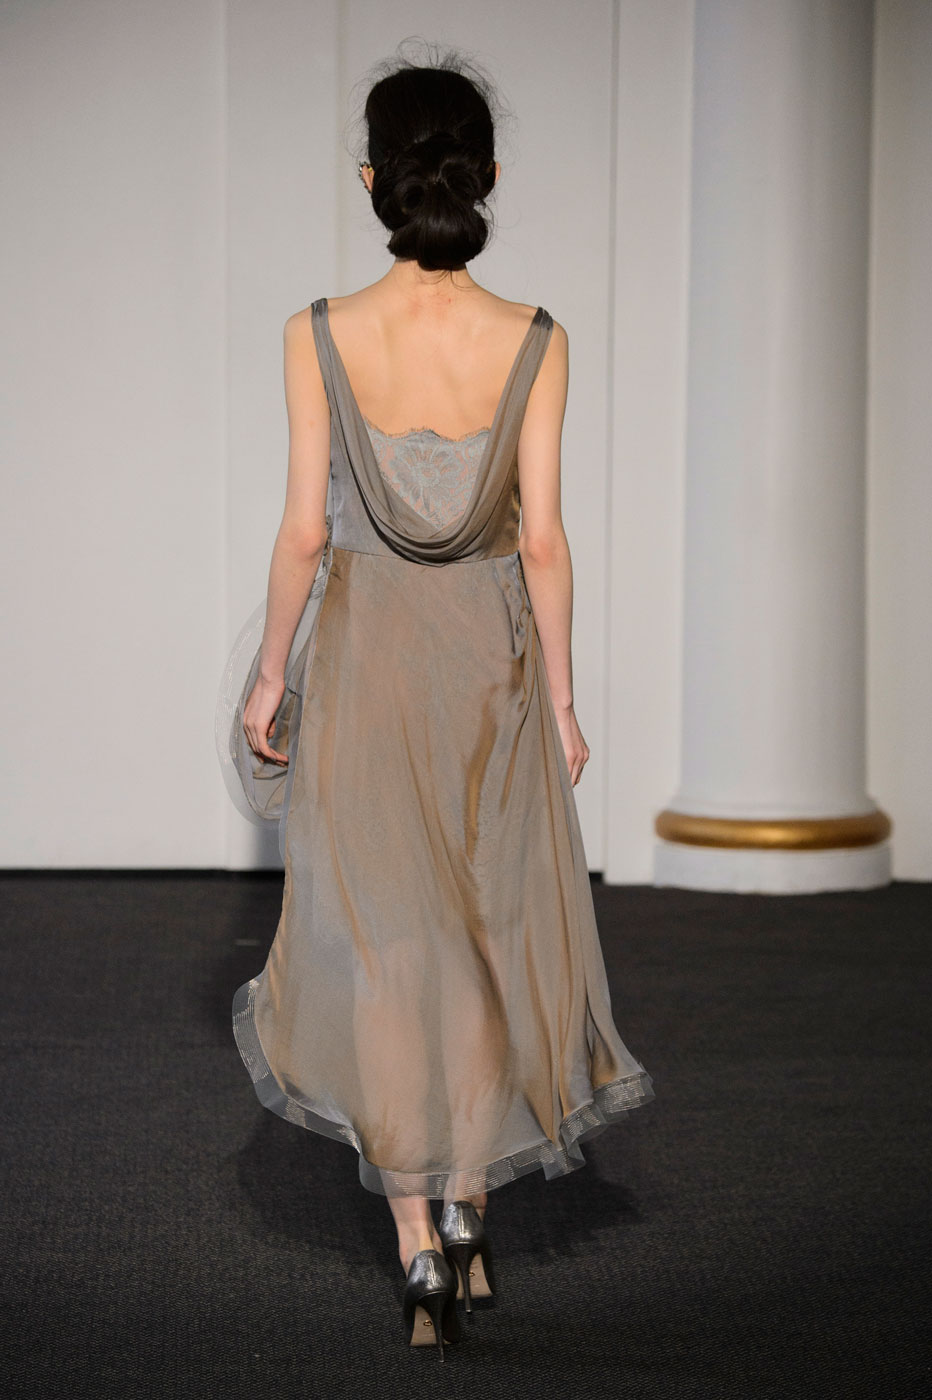 Busardi-fashion-runway-show-haute-couture-paris-spring-2015-the-impression-24